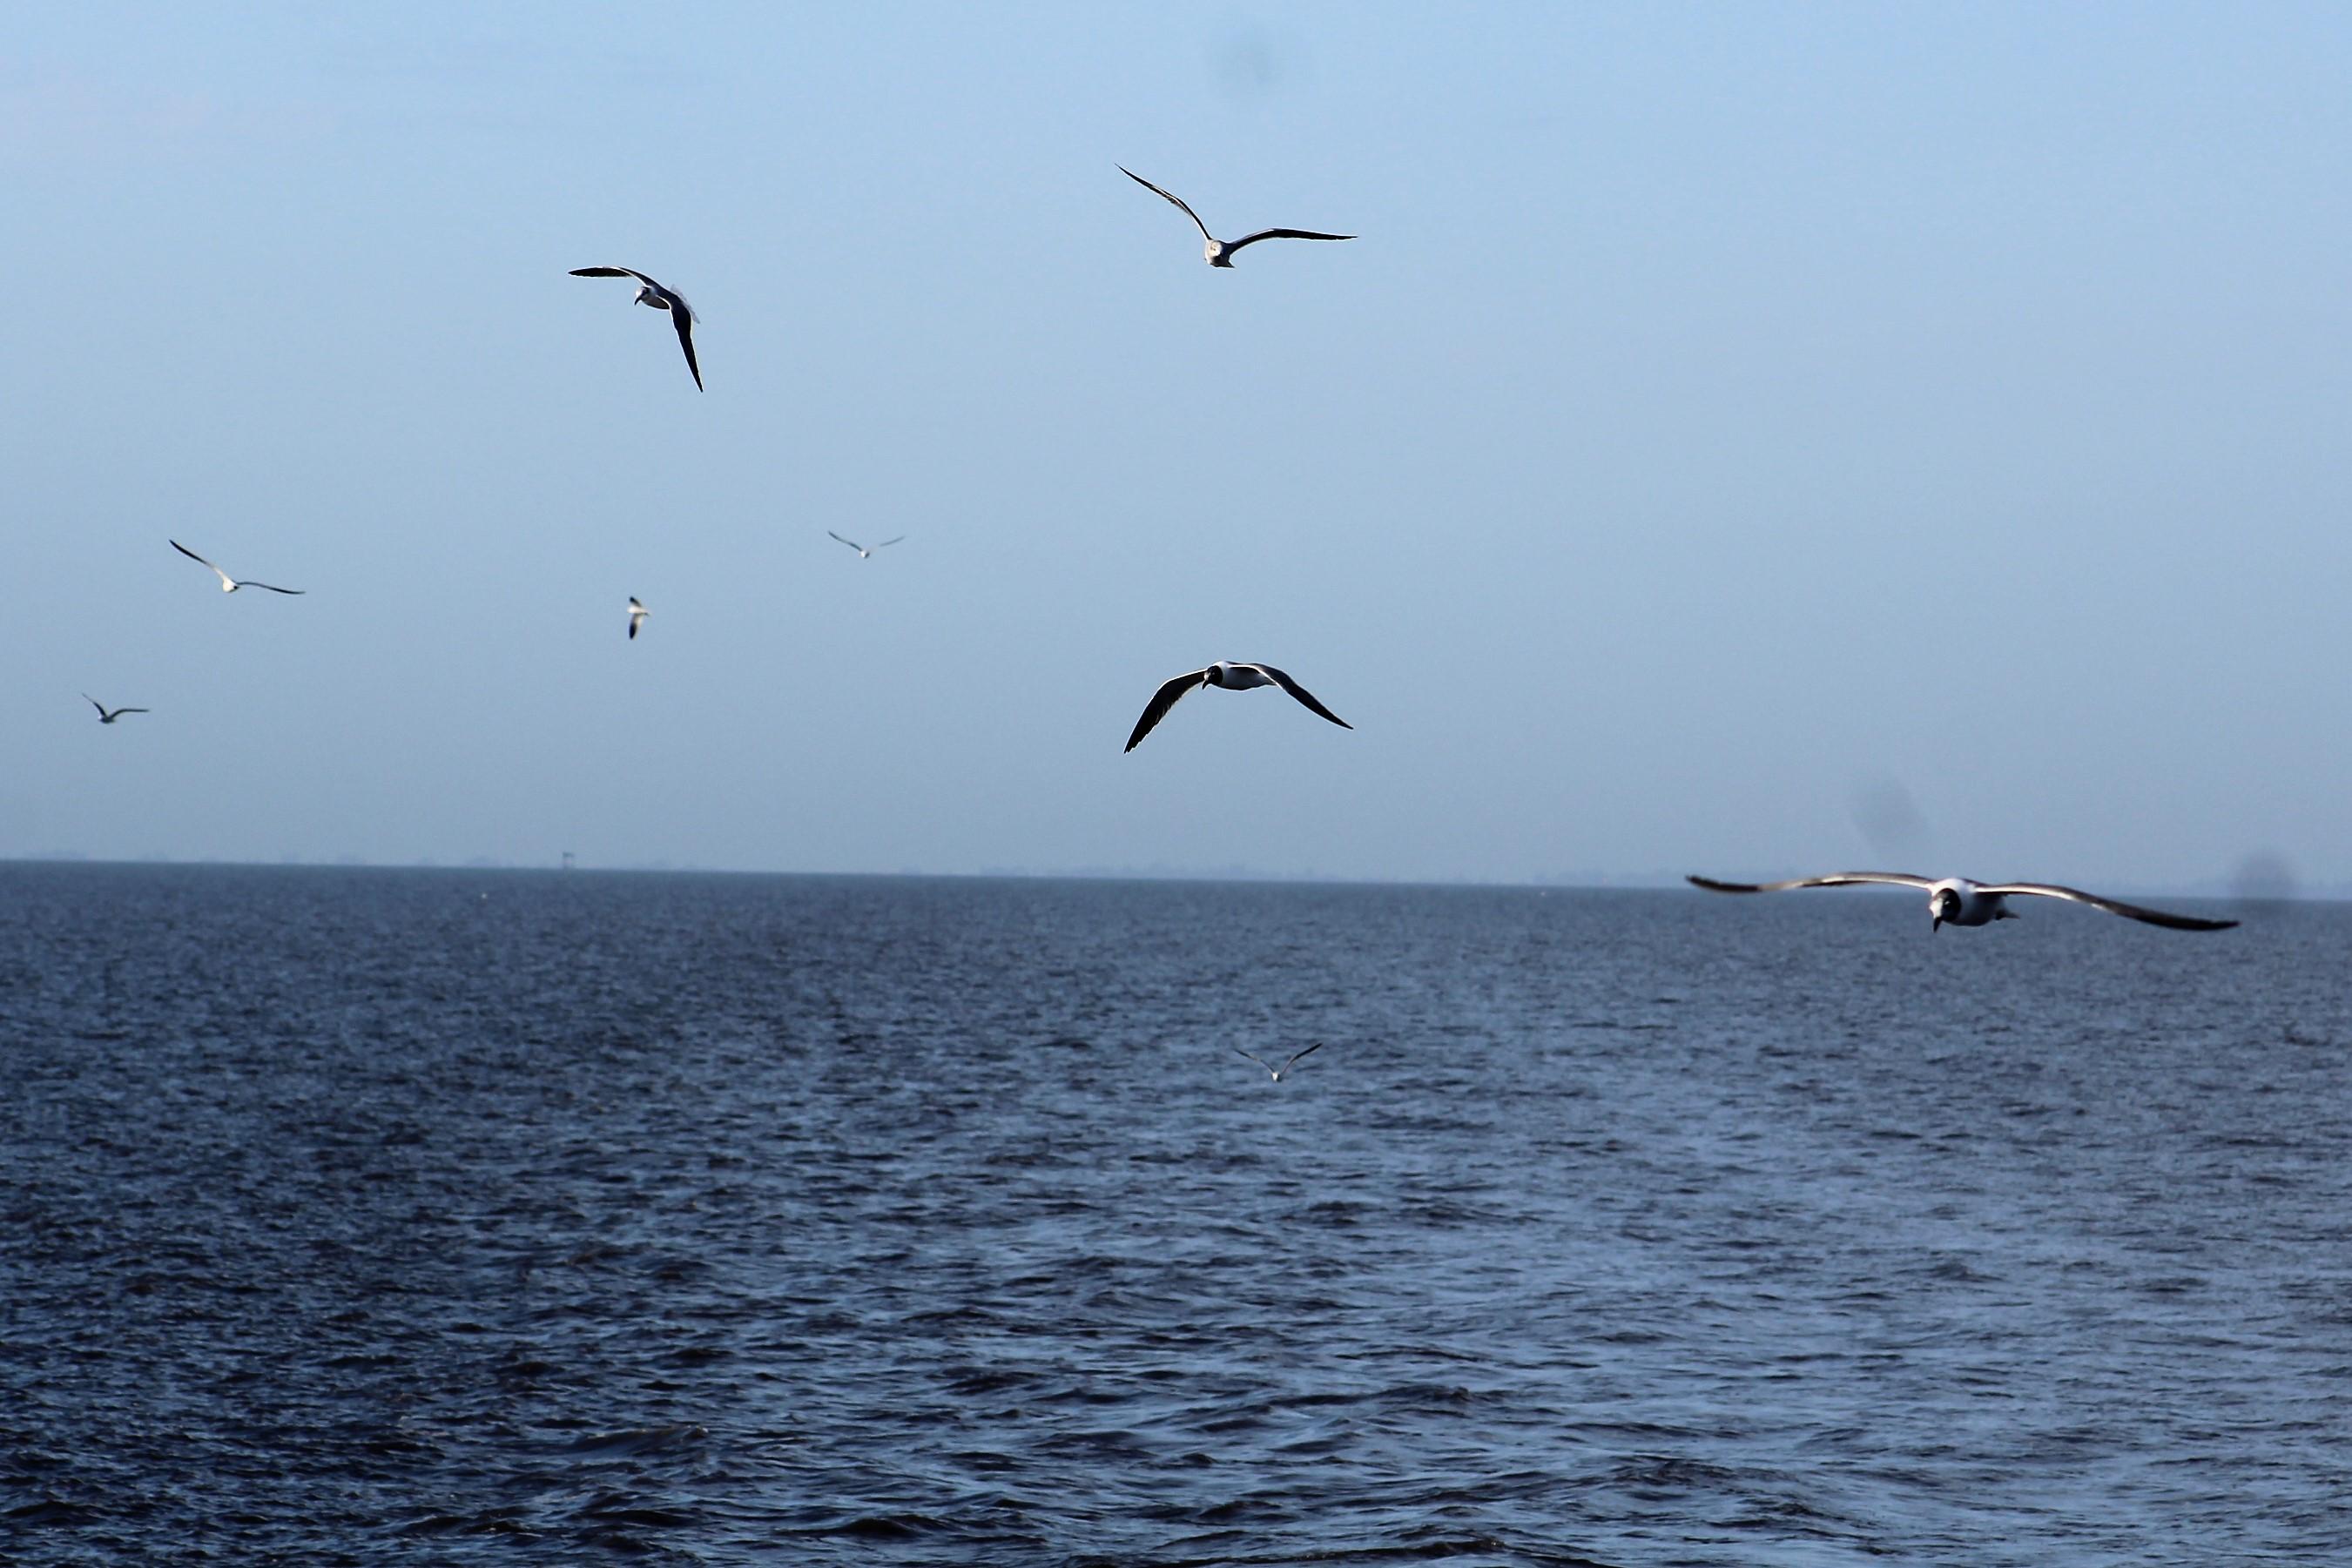 13 Birds following wake